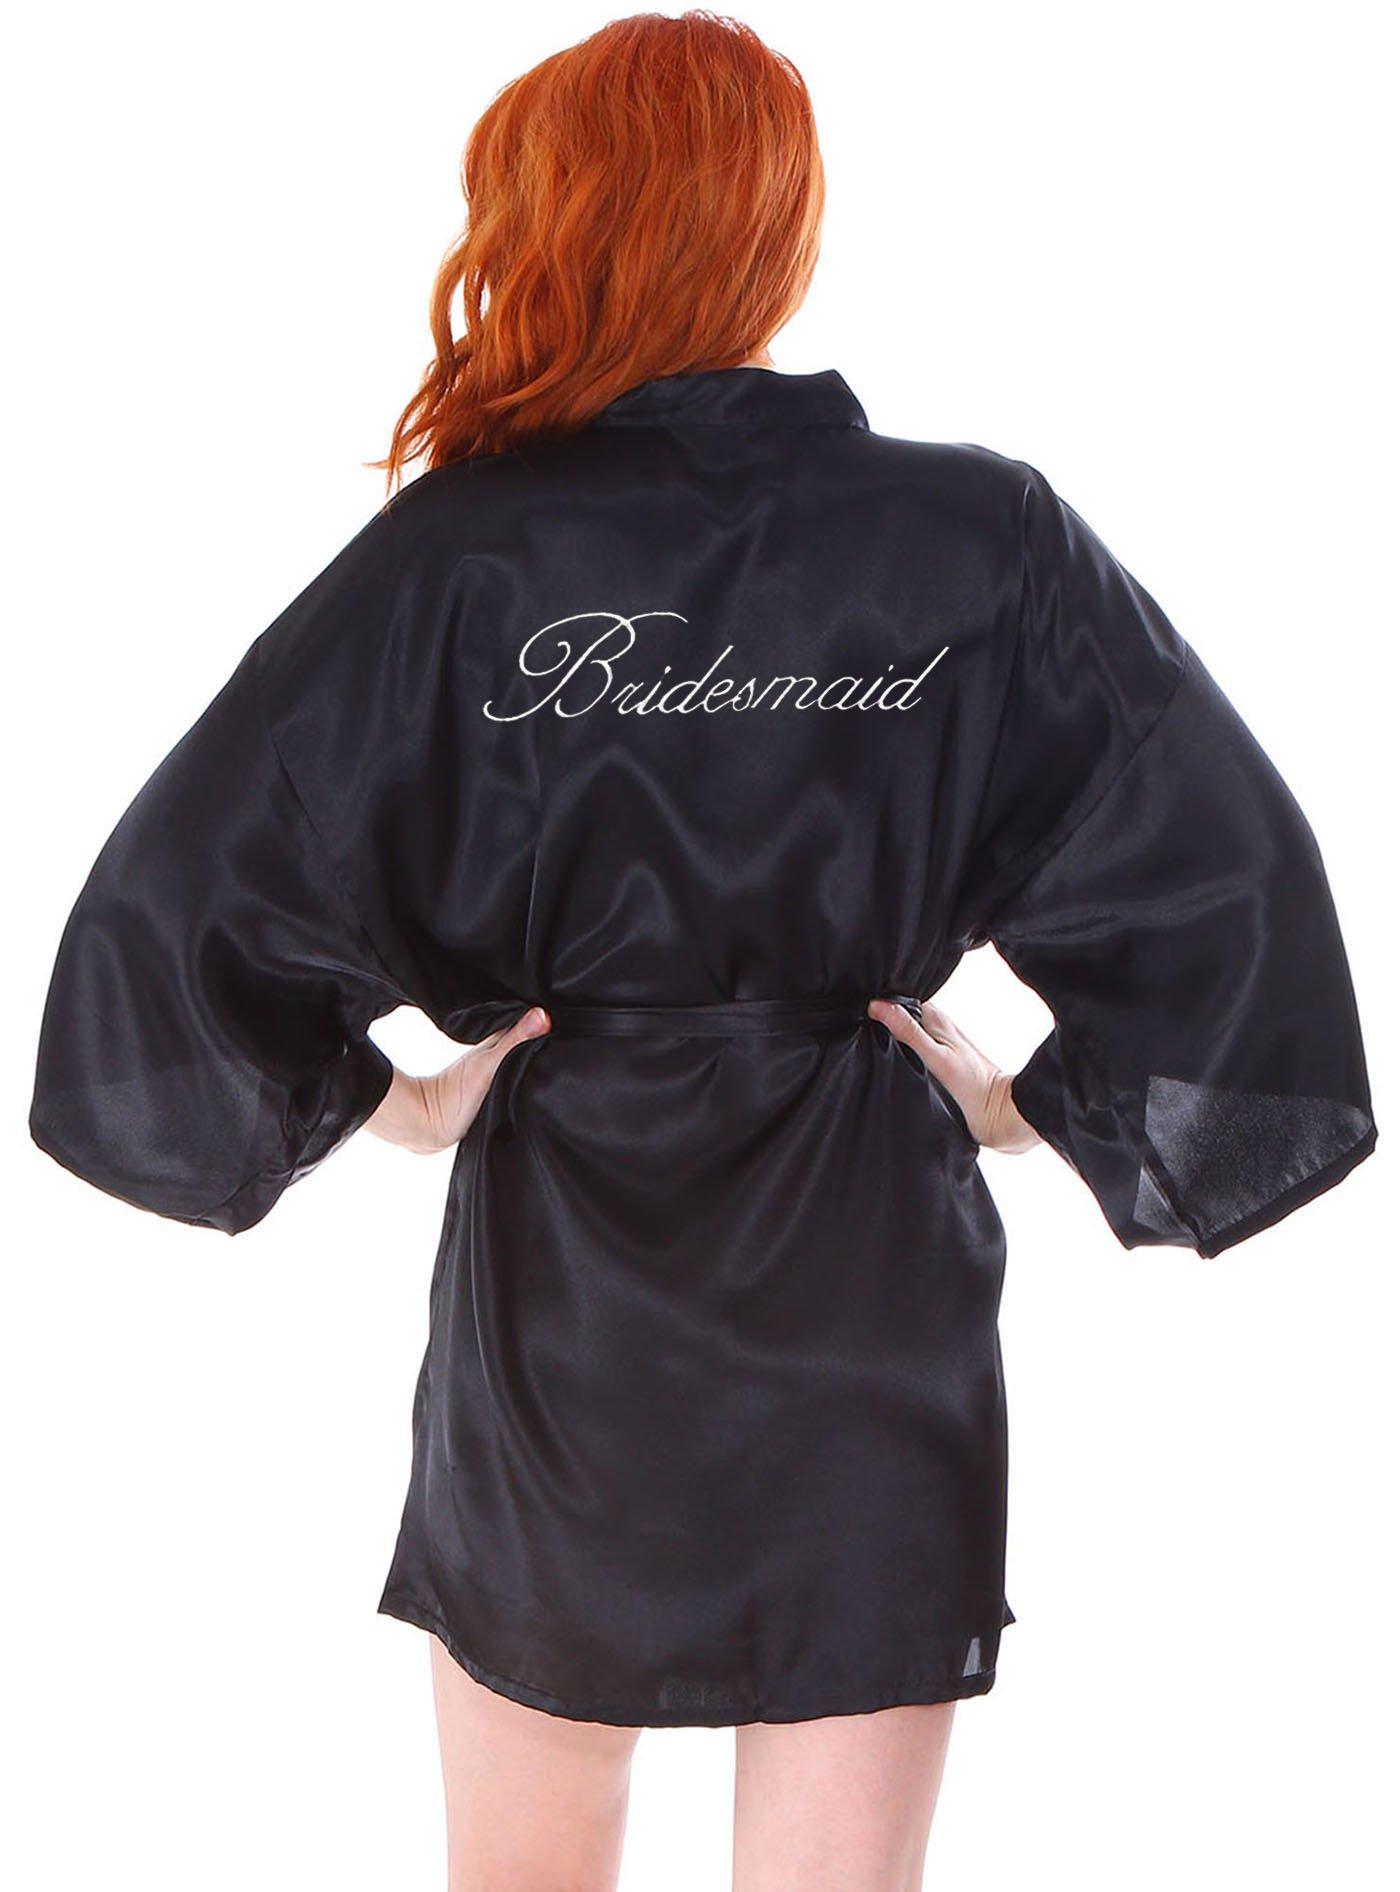 AshopZ Personalized Custom Embroidery Wedding Short Kimono Silk Satin Bathrobe Black by AshopZ